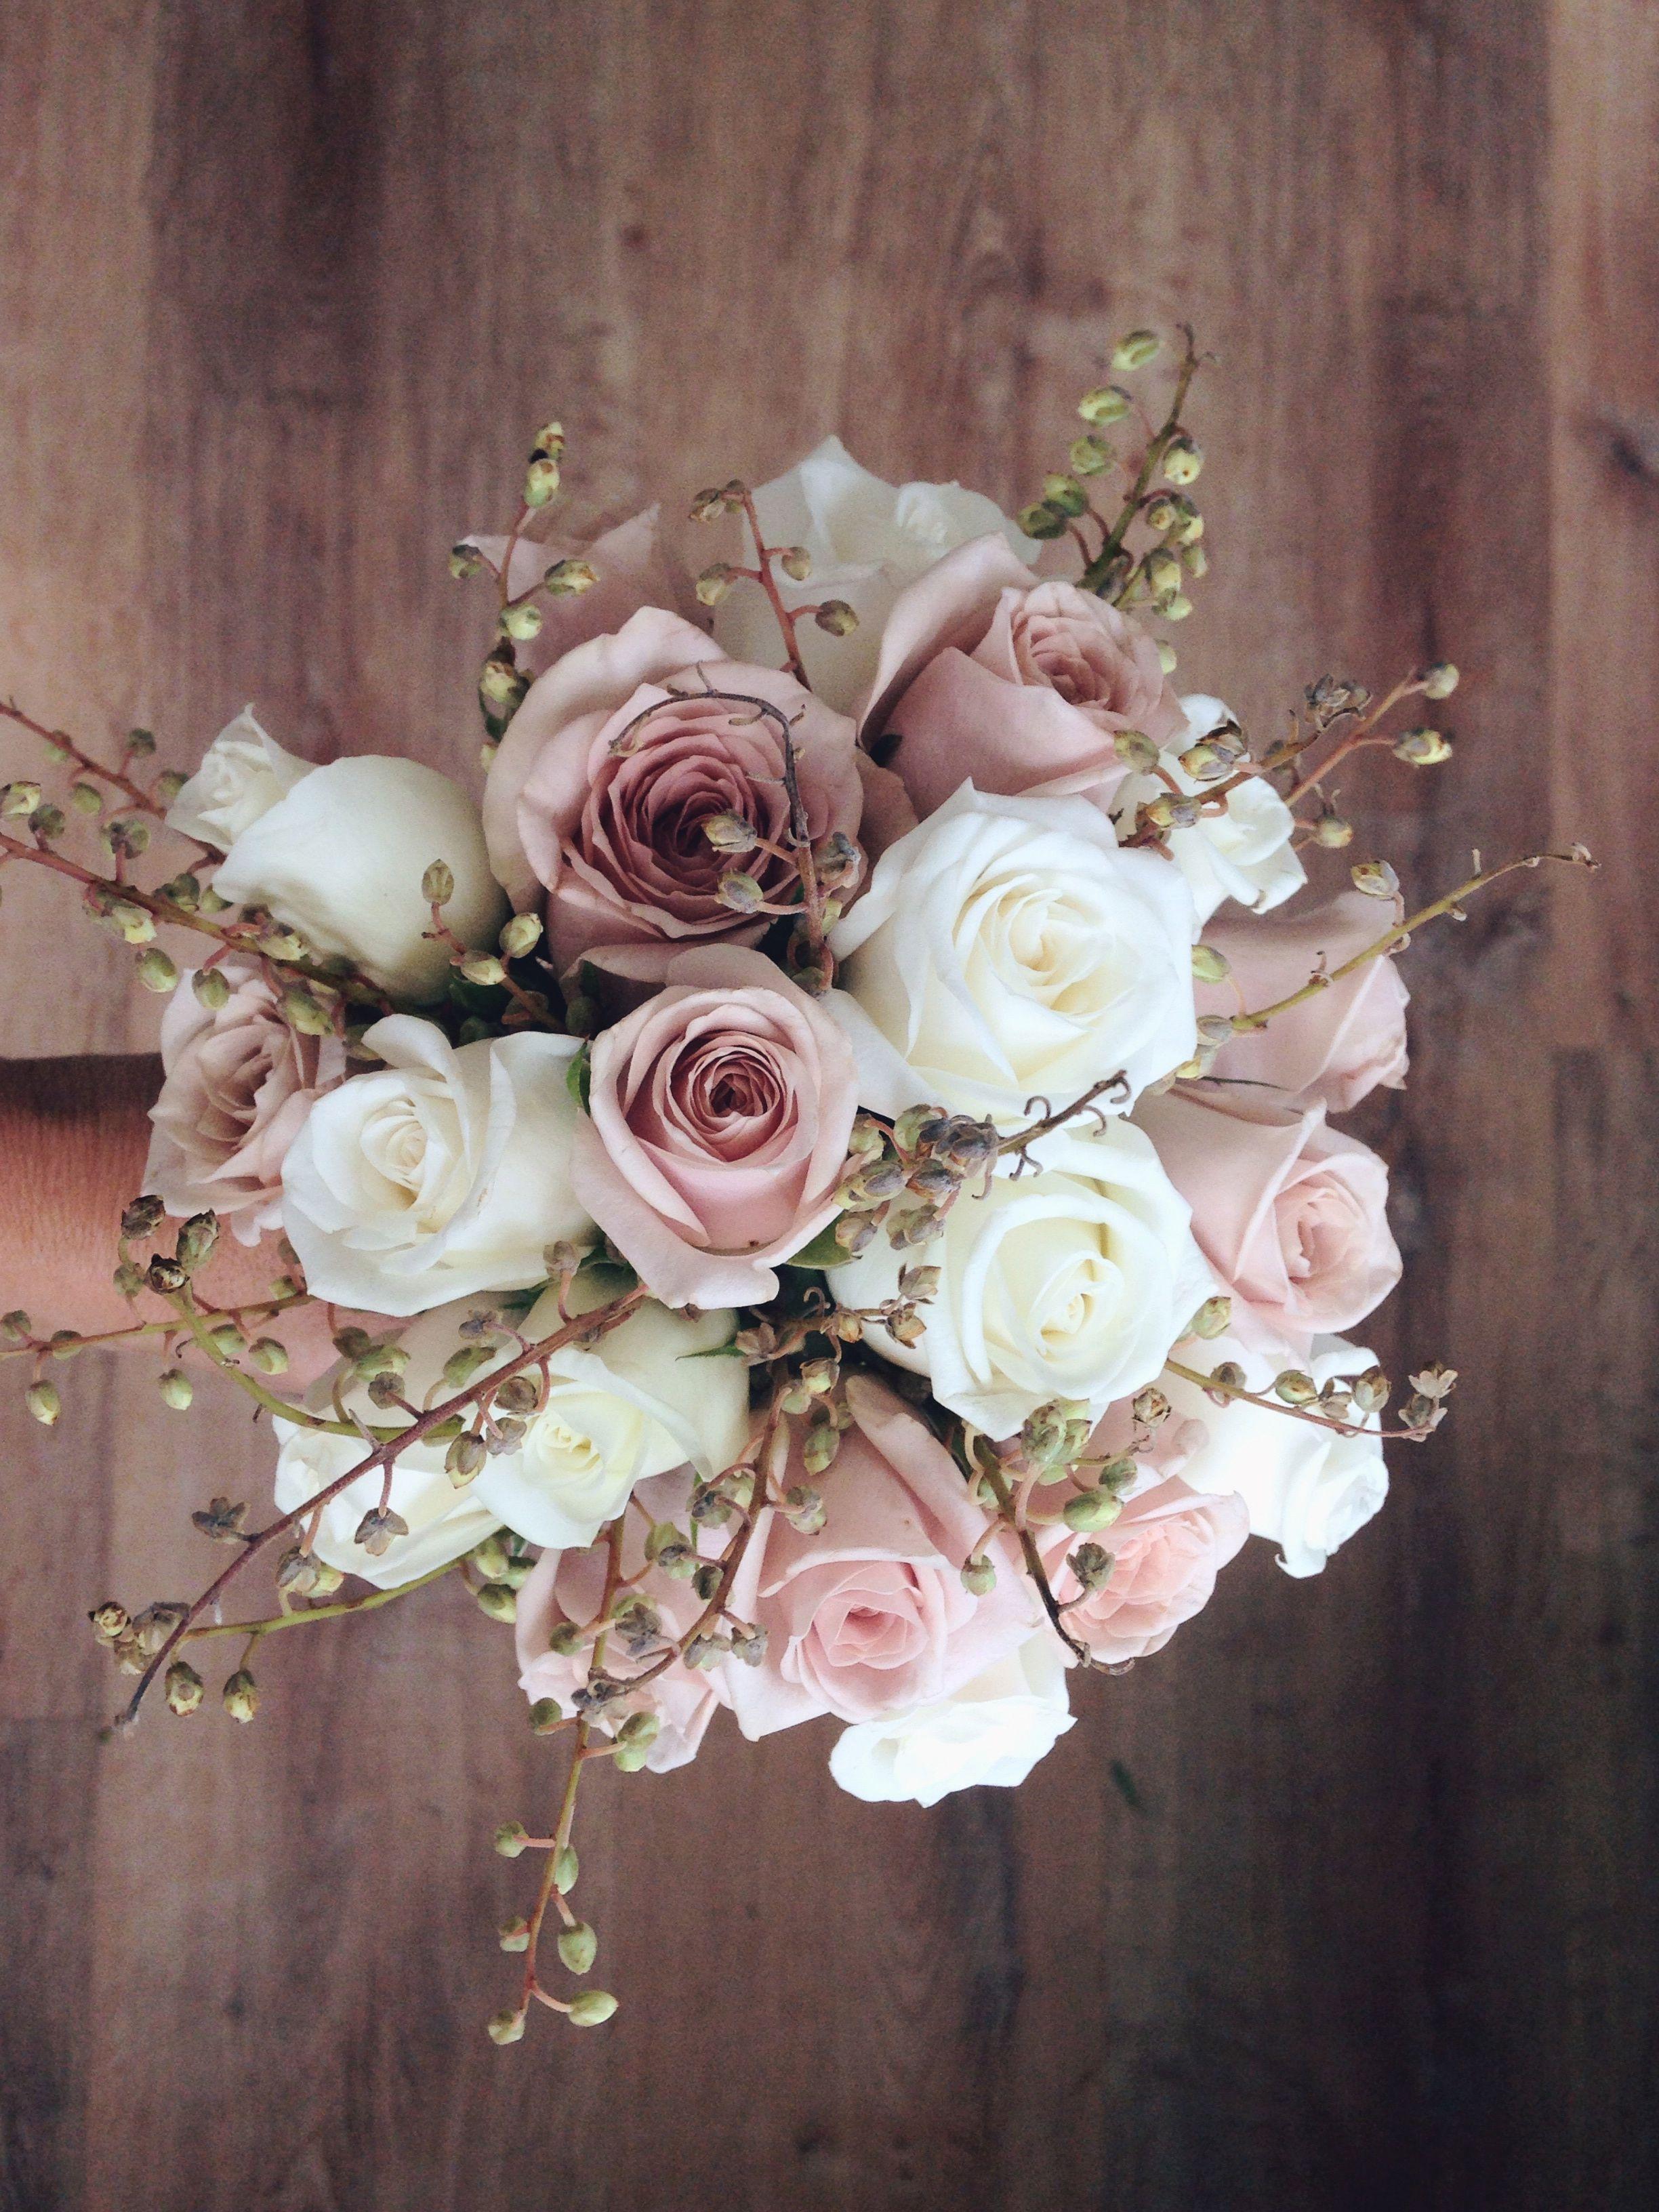 kindredfloral bridal wedding bouquet sydneyflorist